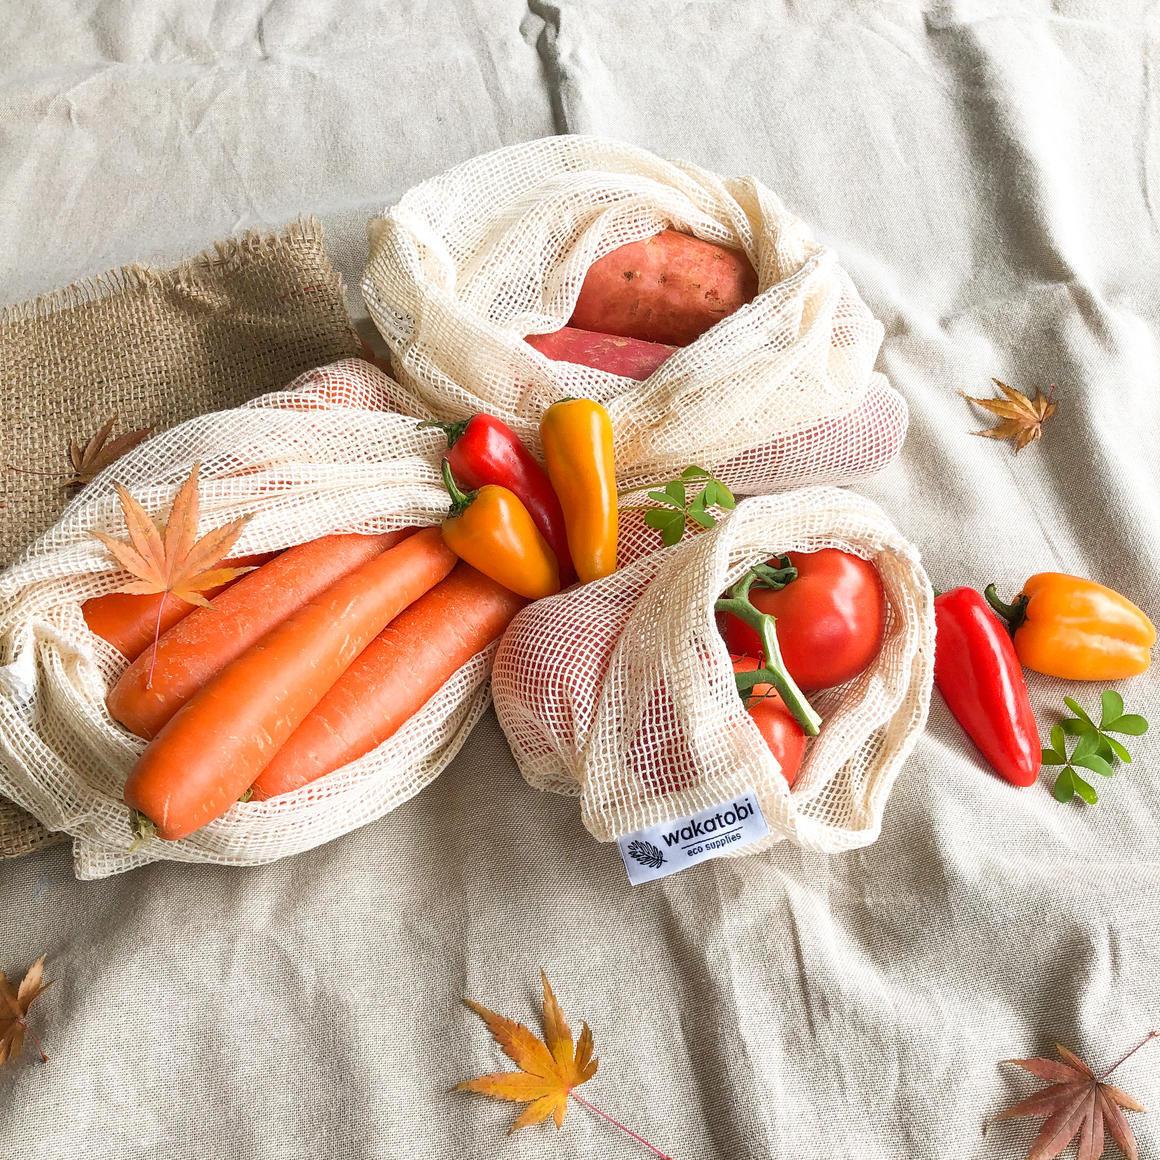 Mesh Produce Bag - Pack of 4pcs   Trada Marketplace